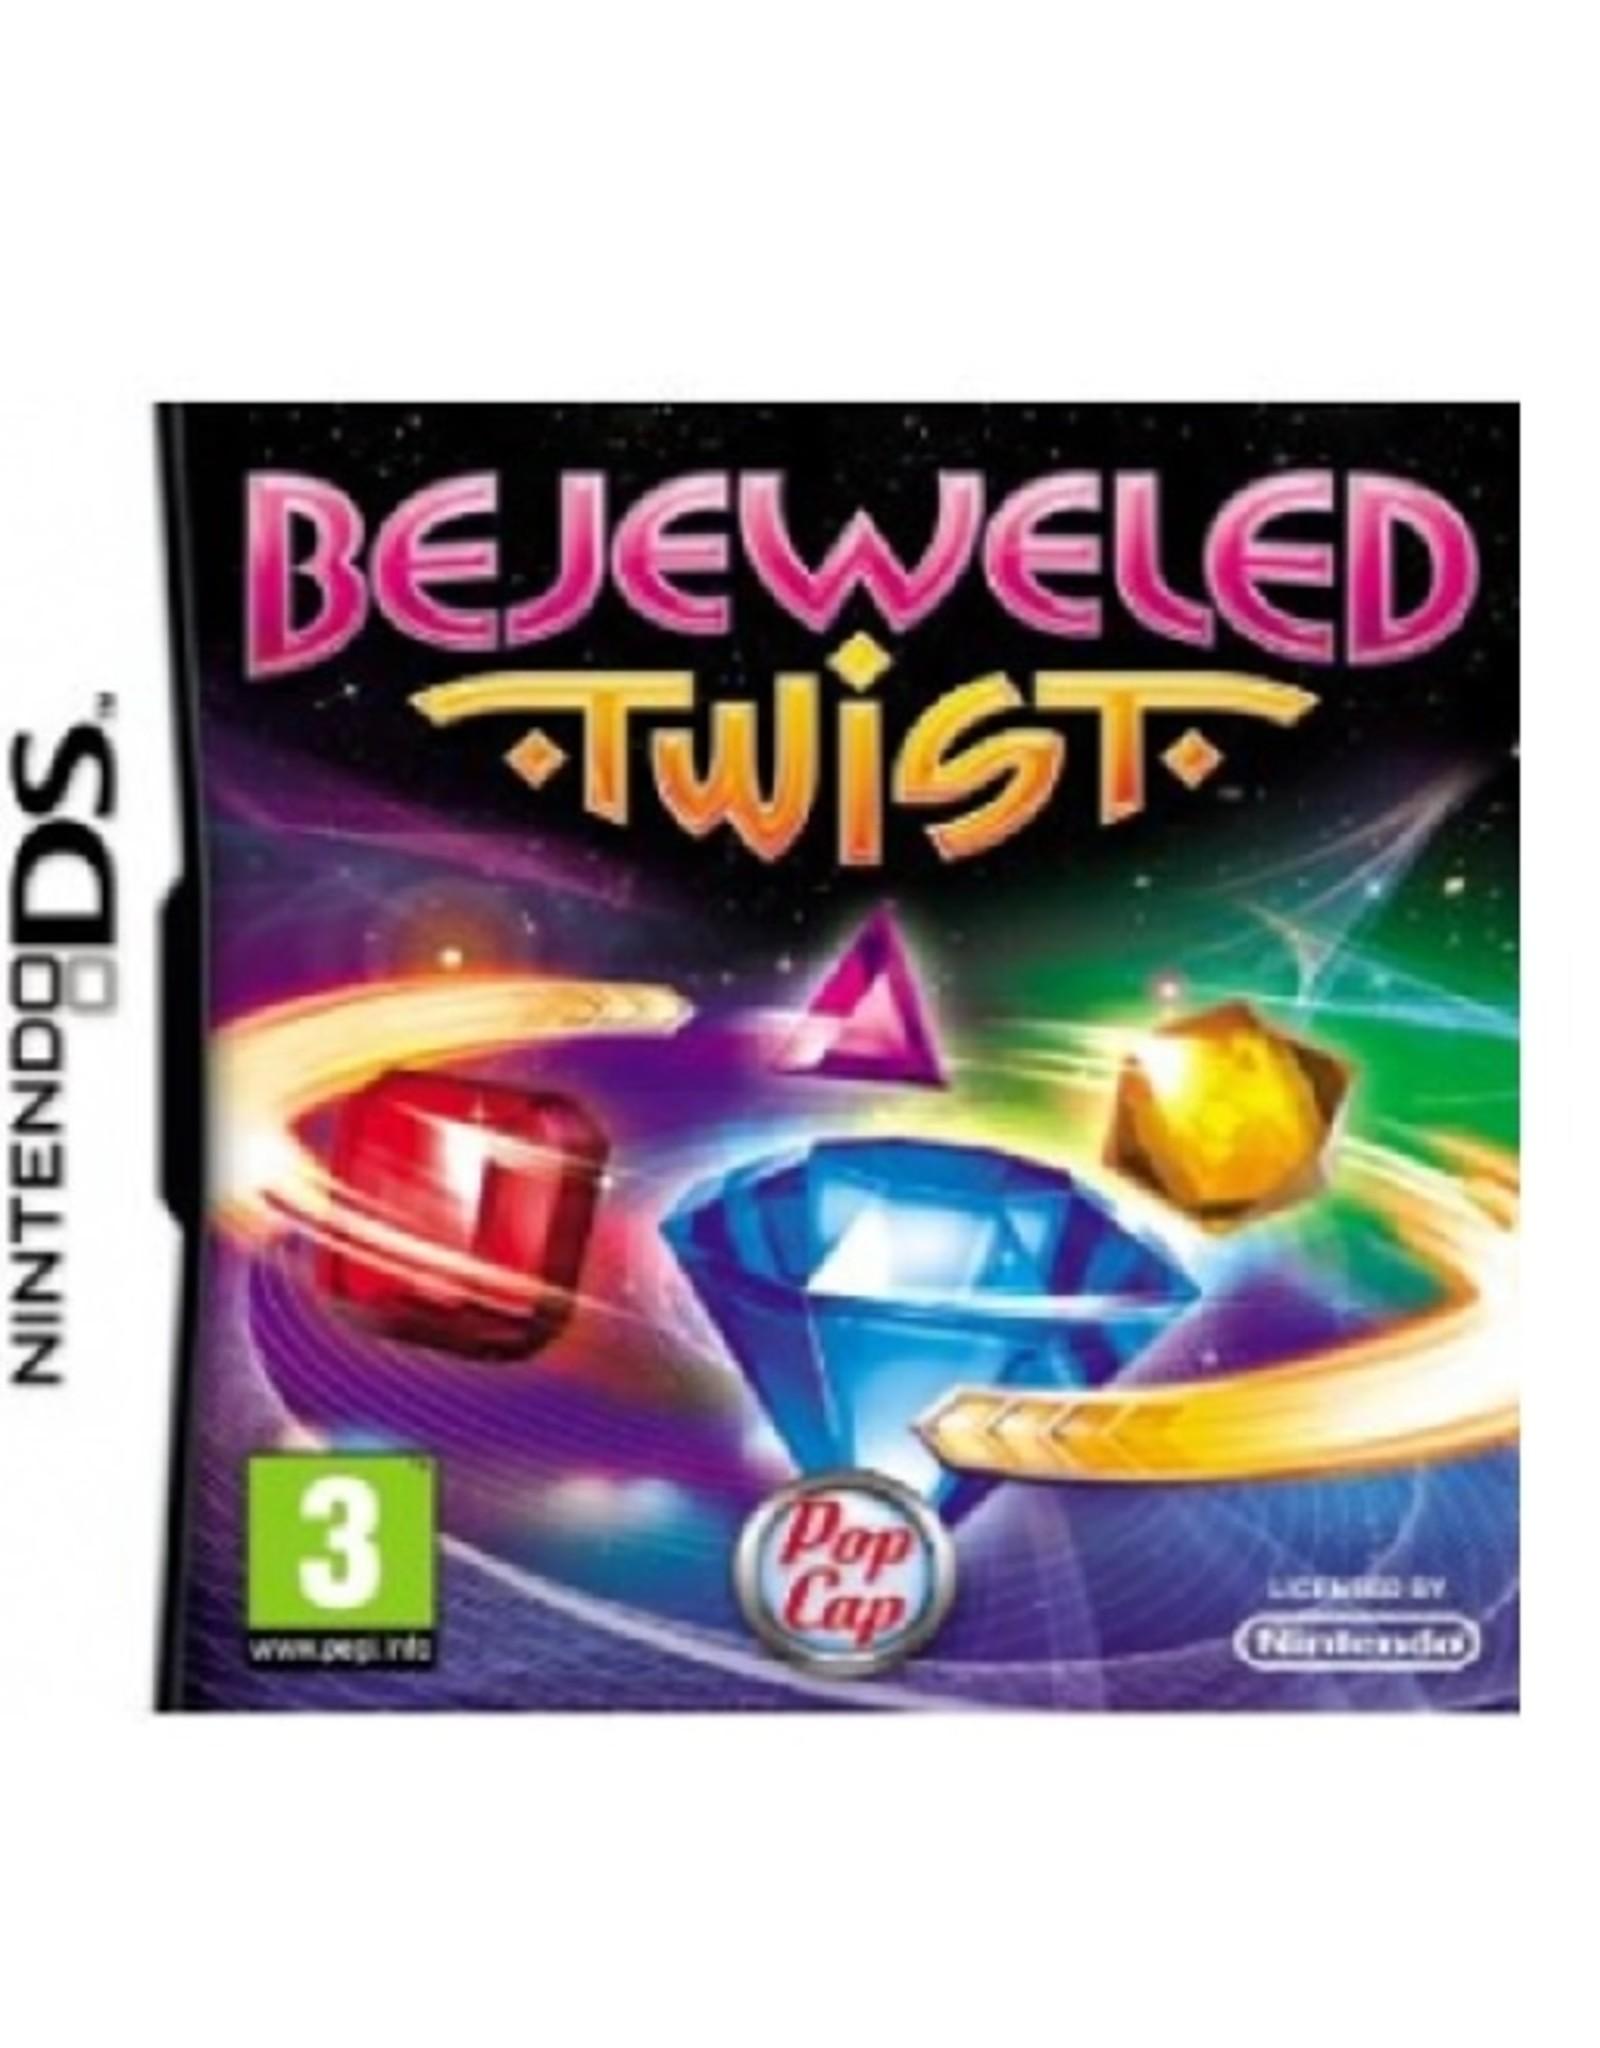 Bejeweled Twist - NDS PrePlayed